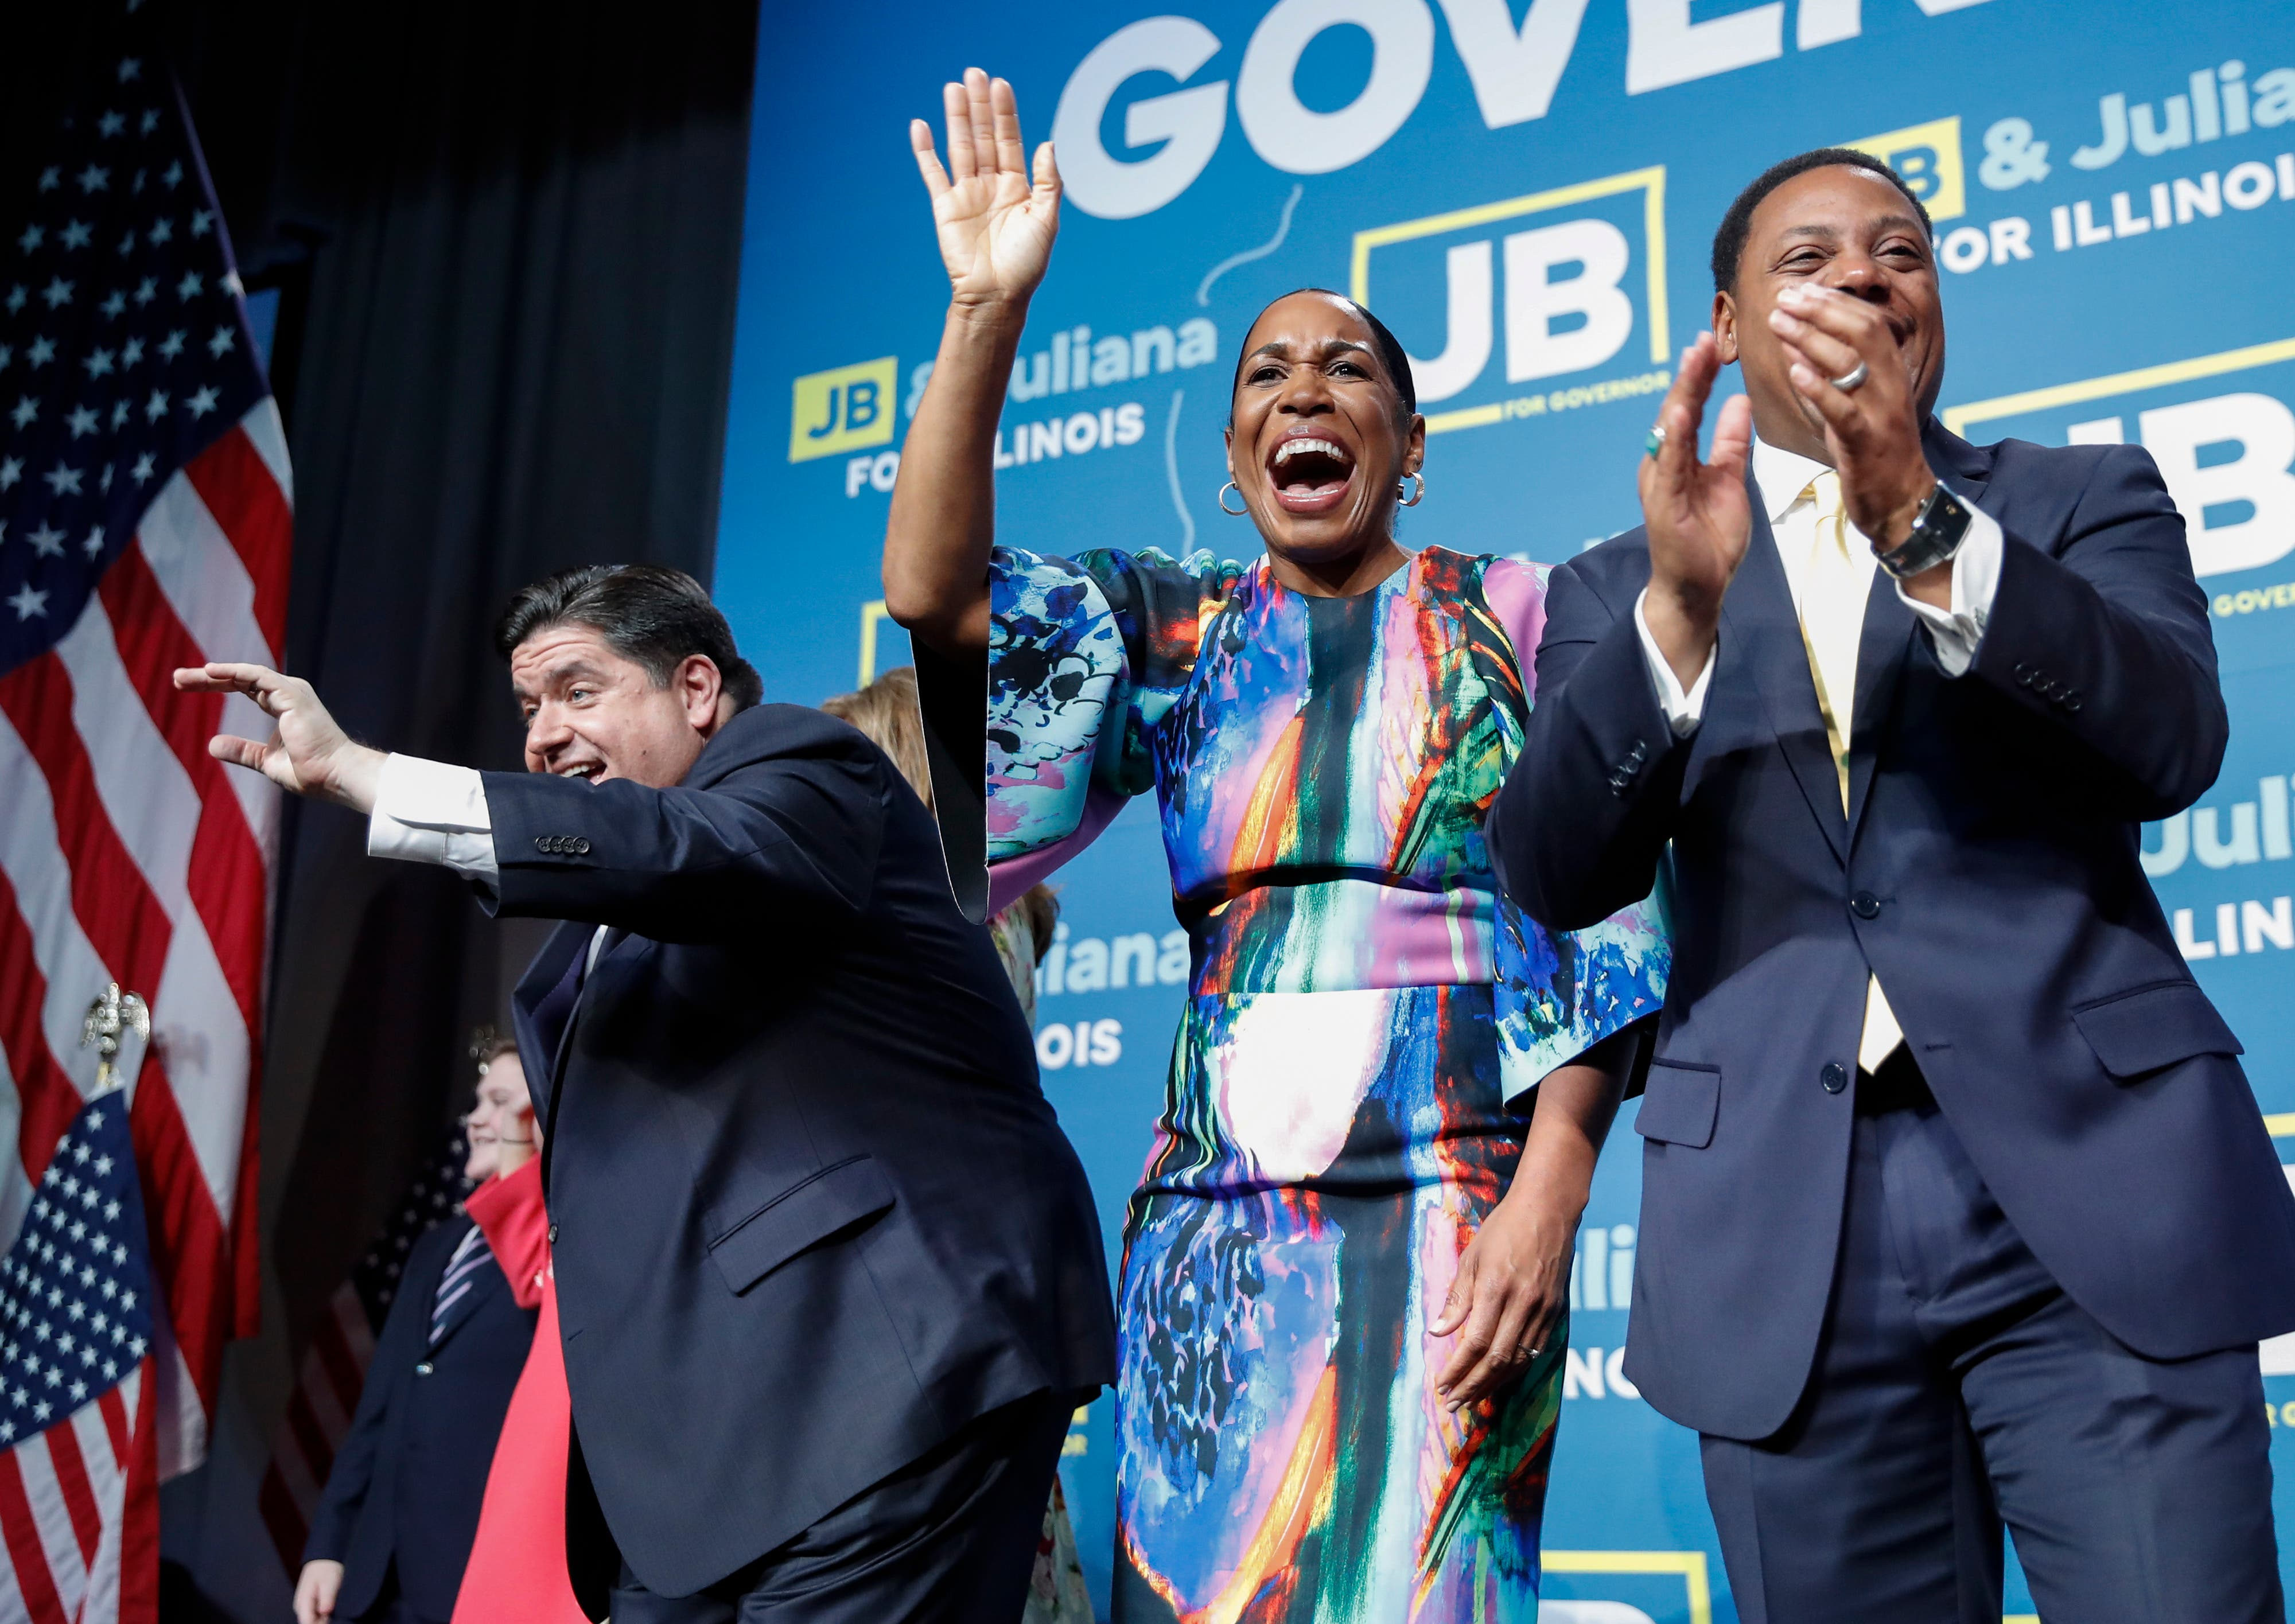 Gouverneur JB Pritzker (links) feiert mit Gouverneurin Juliana Stratton und Bruce Rauner. (Bild: EPA/Kamil Krzaczynski, Chicago, 6. November 2018)